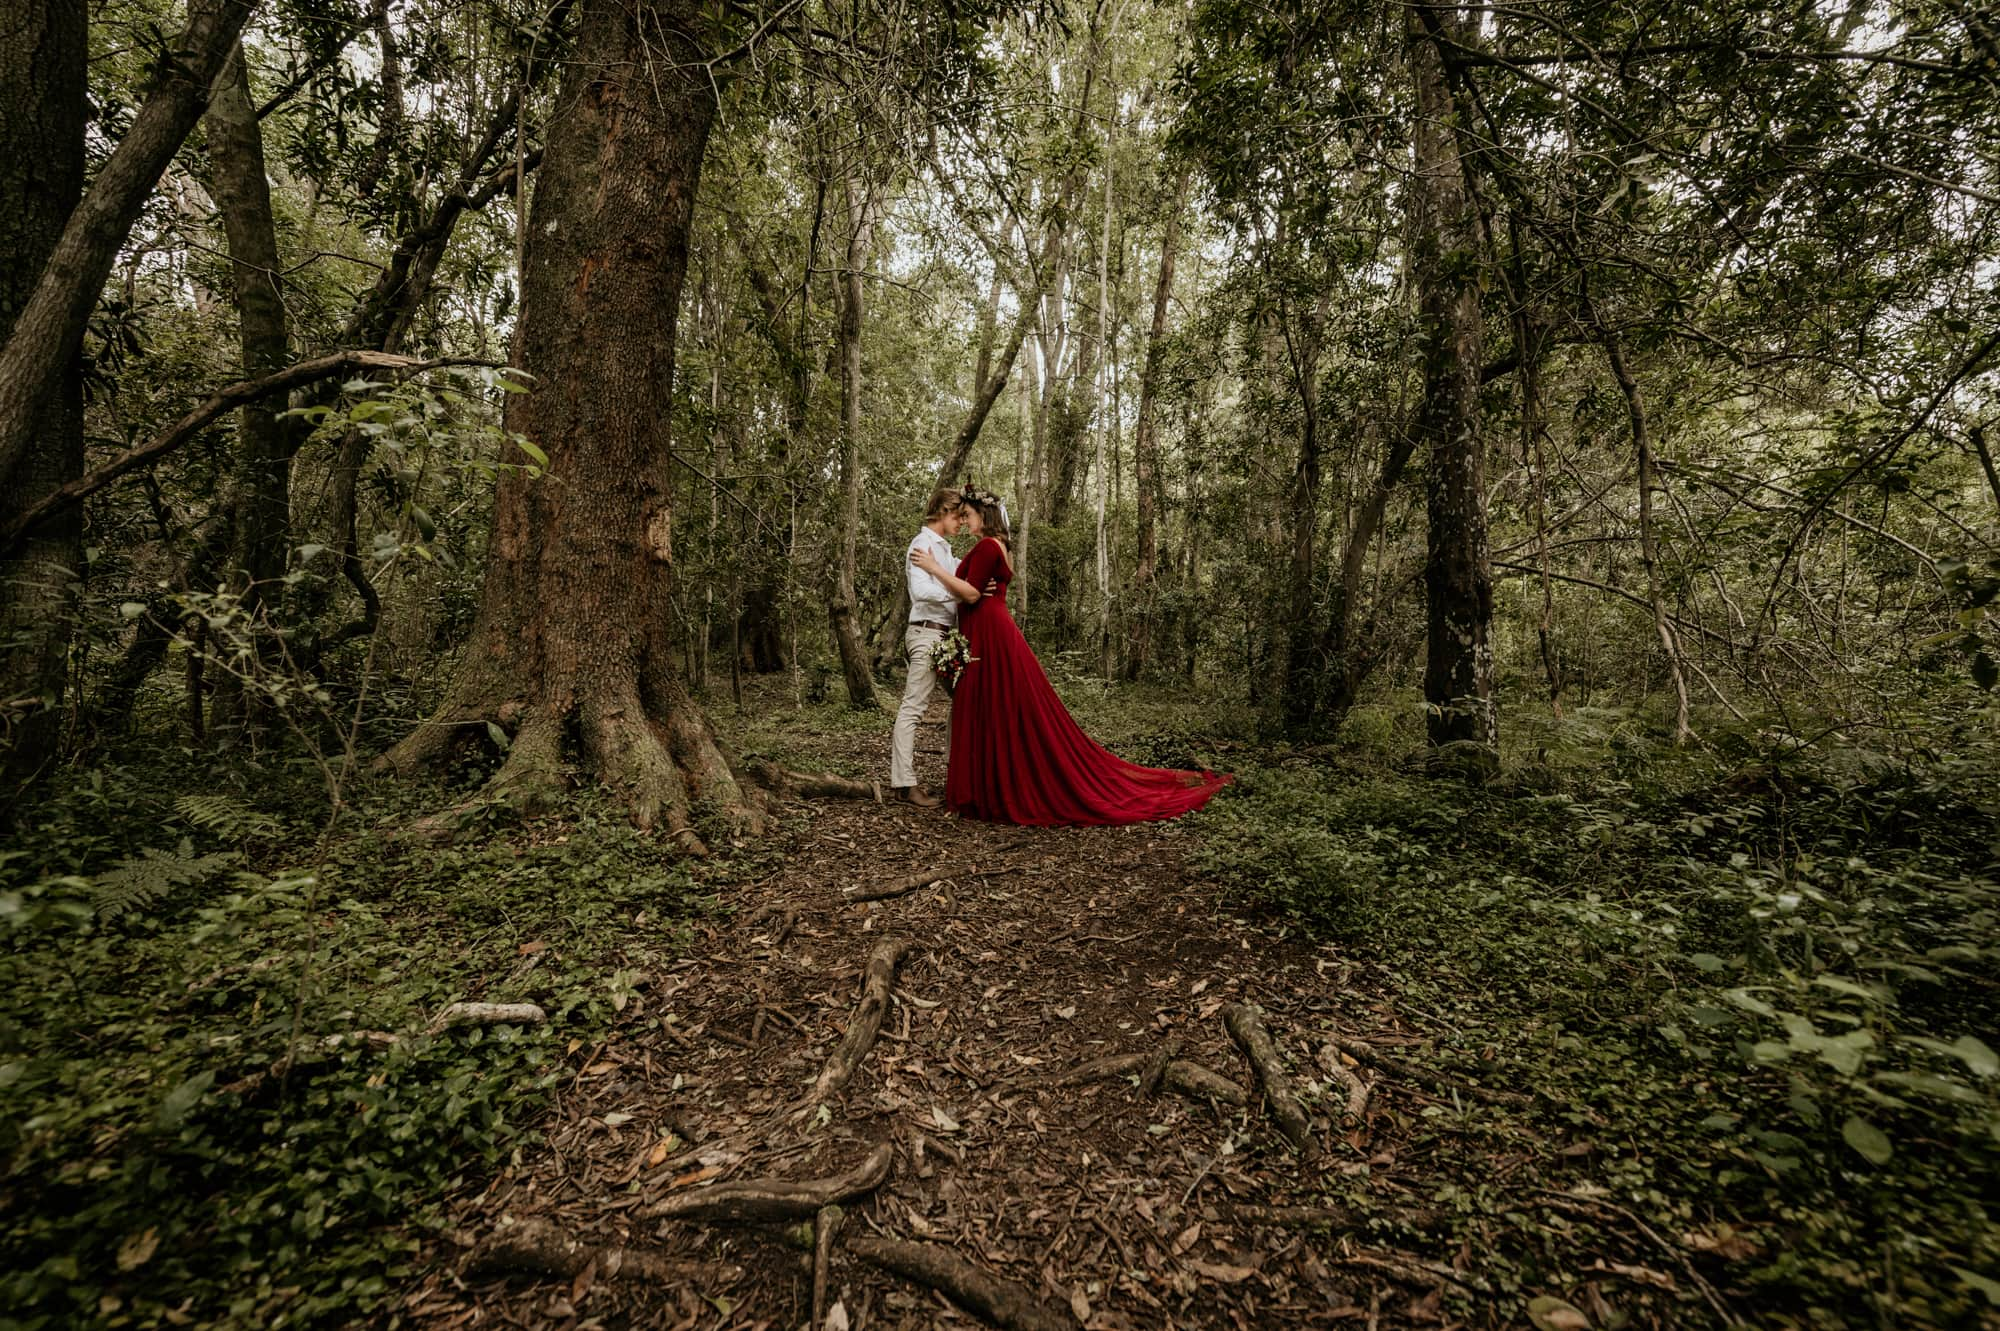 wesley-lanie-george-fernridge-engagement-June-Richards-Photography-Destination-Weddings-Elopements-Garden-Route-27